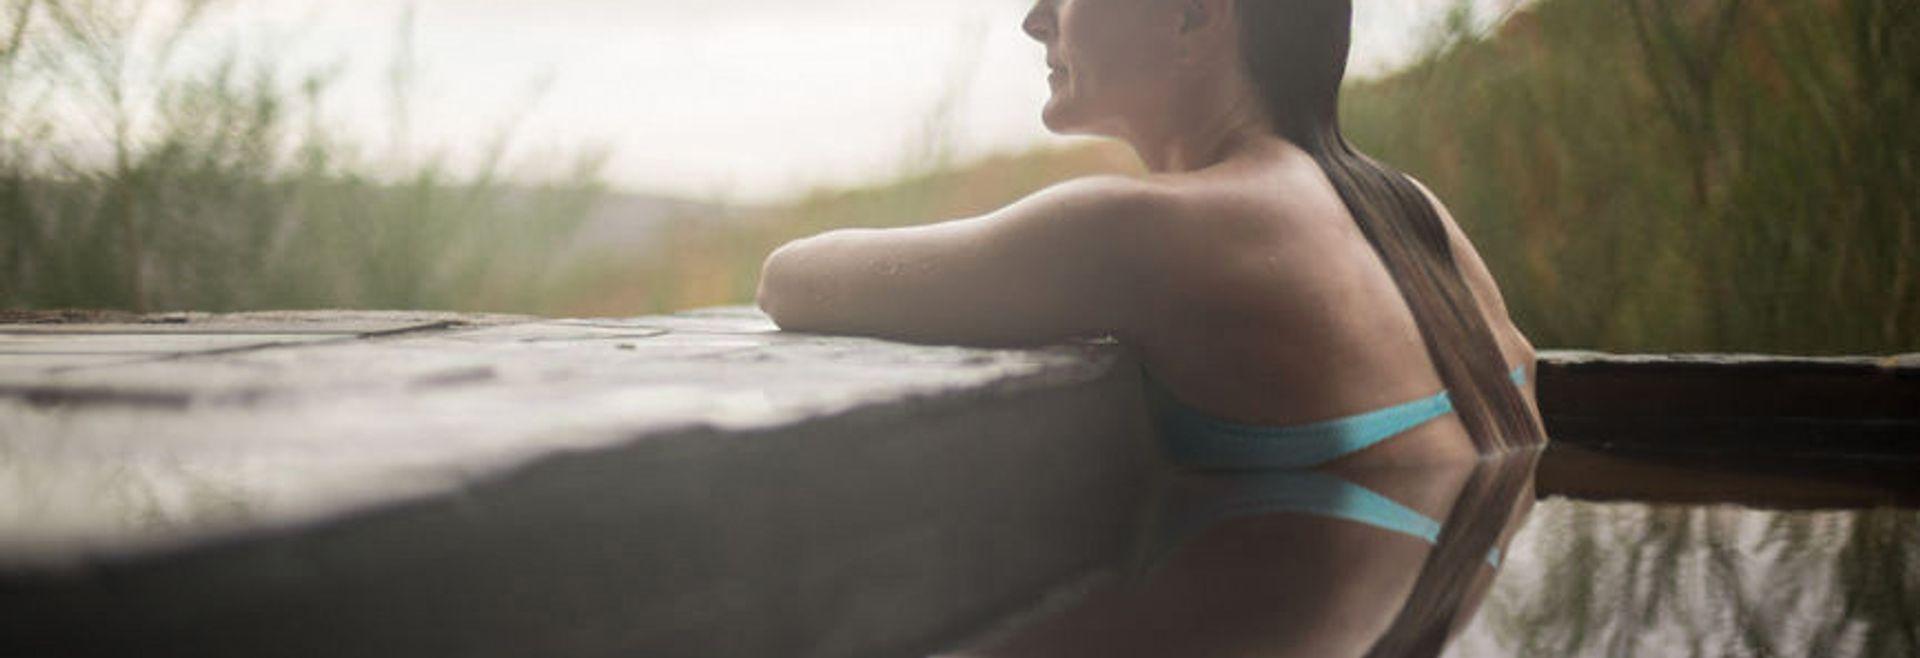 Houston Texas Woman Relaxing in Spa | Shea Homes